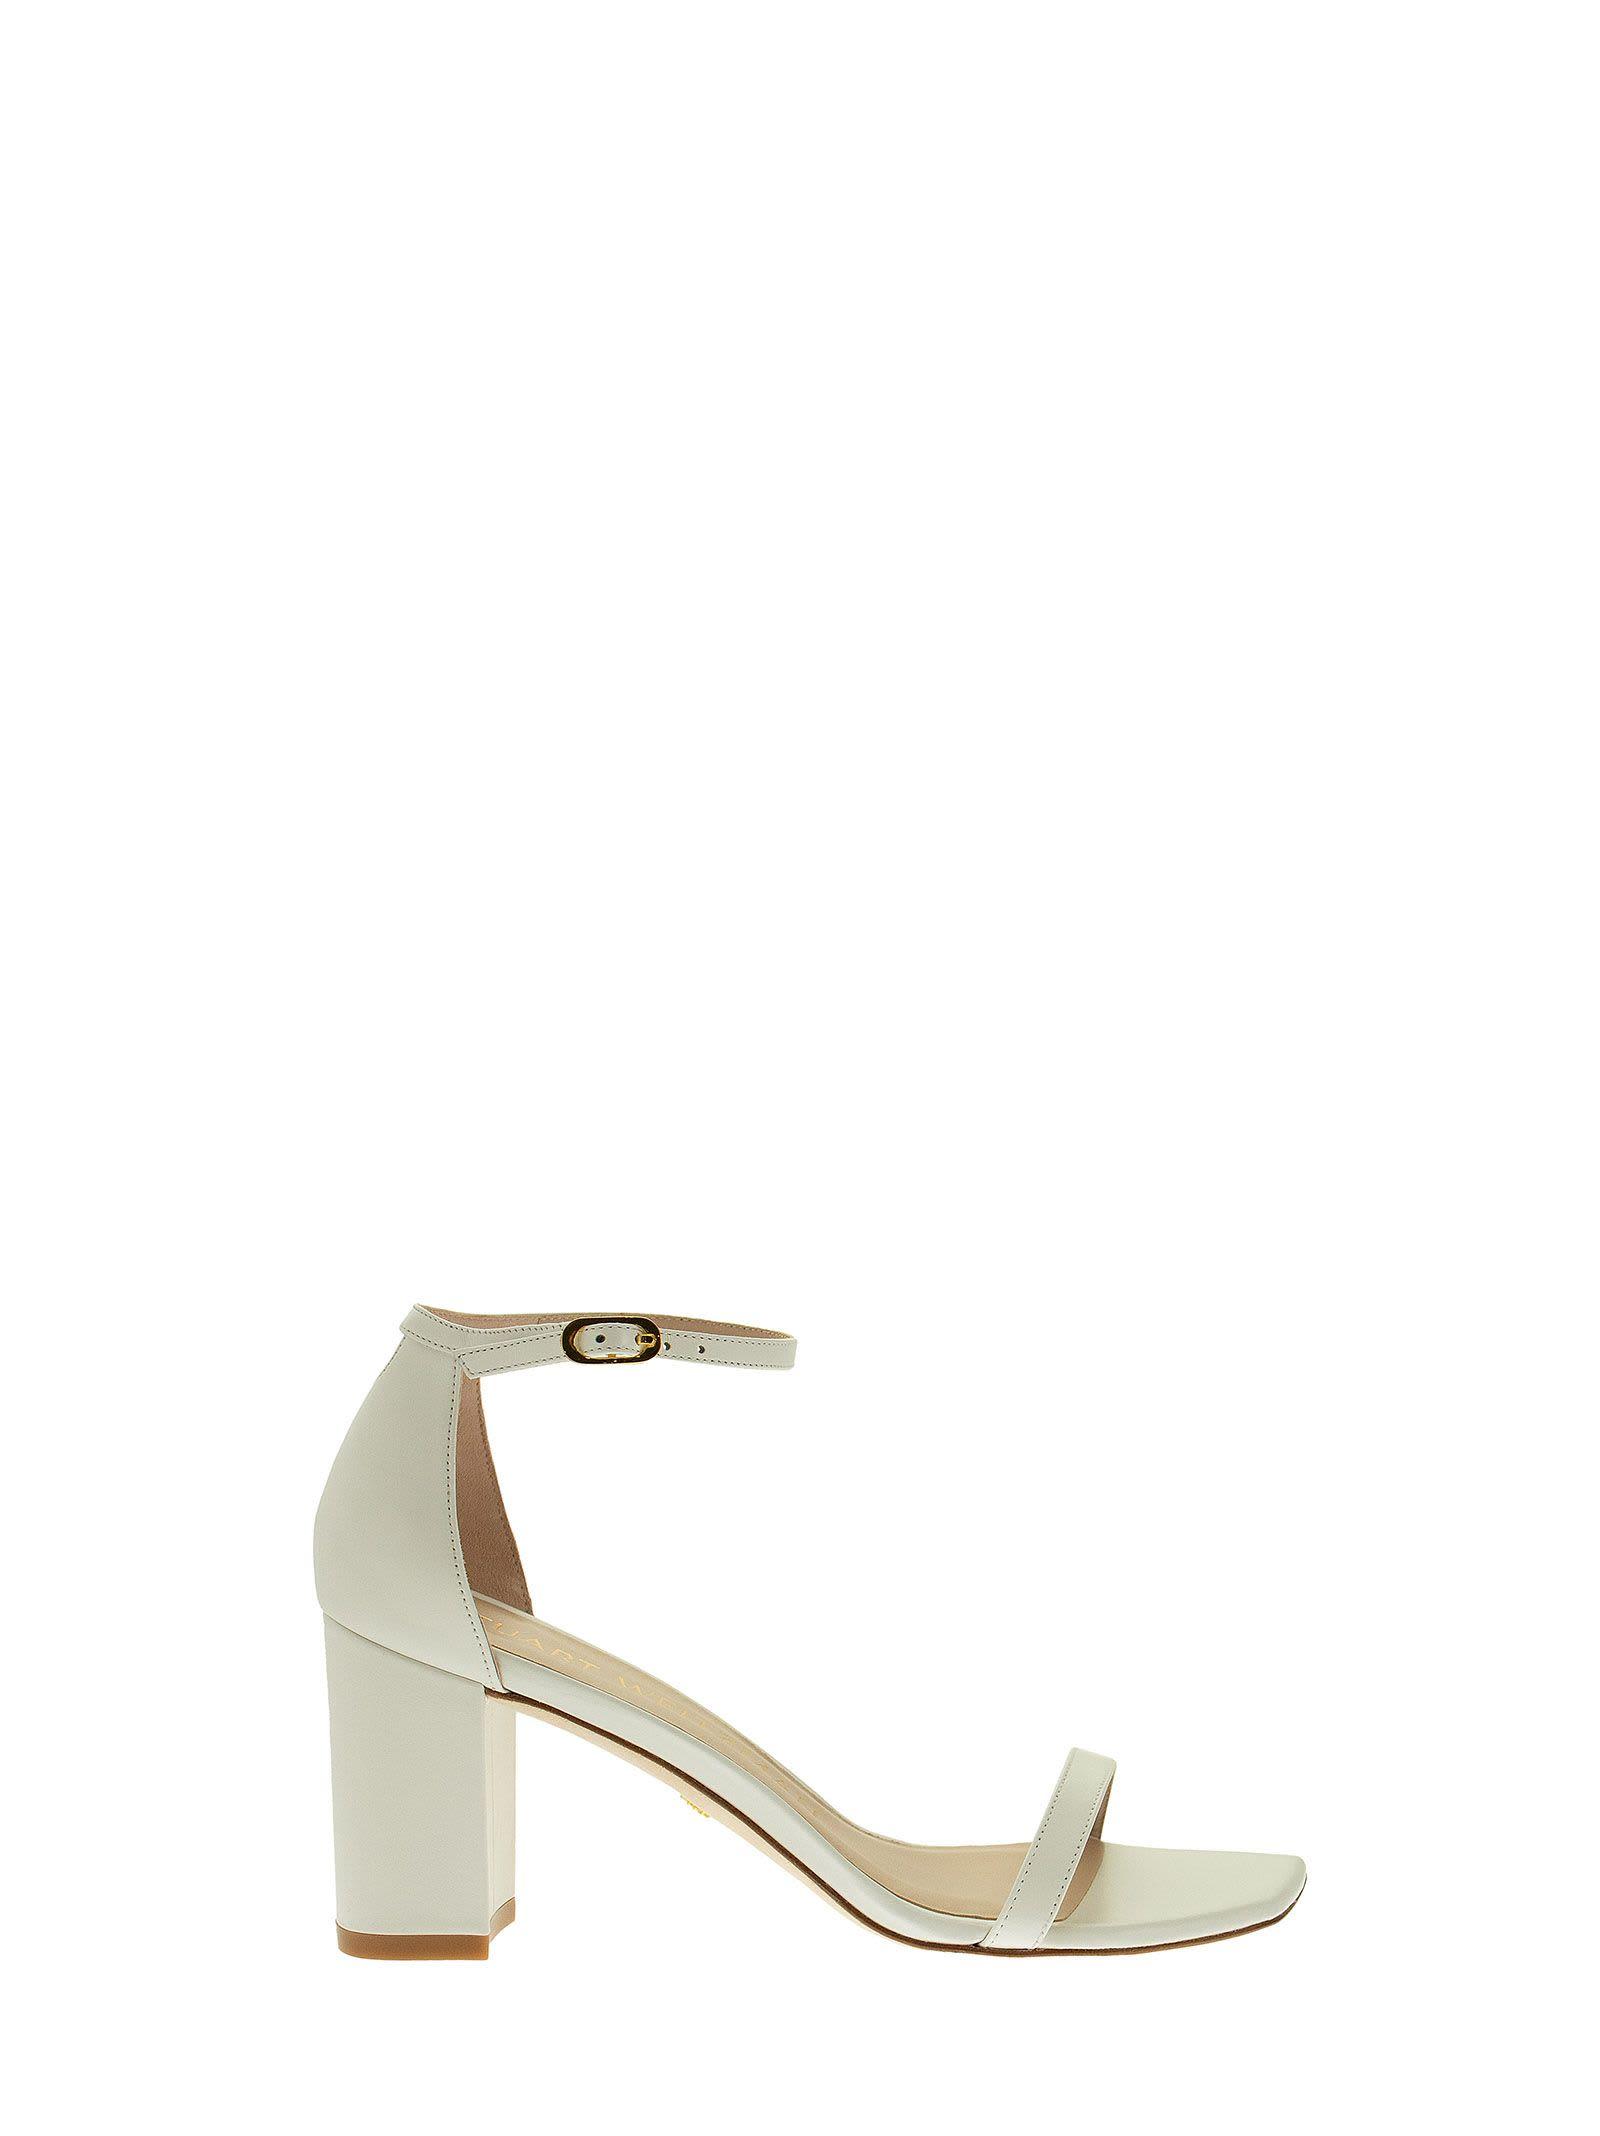 Buy Stuart Weitzman Amelina Block - Heeled Sandal online, shop Stuart Weitzman shoes with free shipping